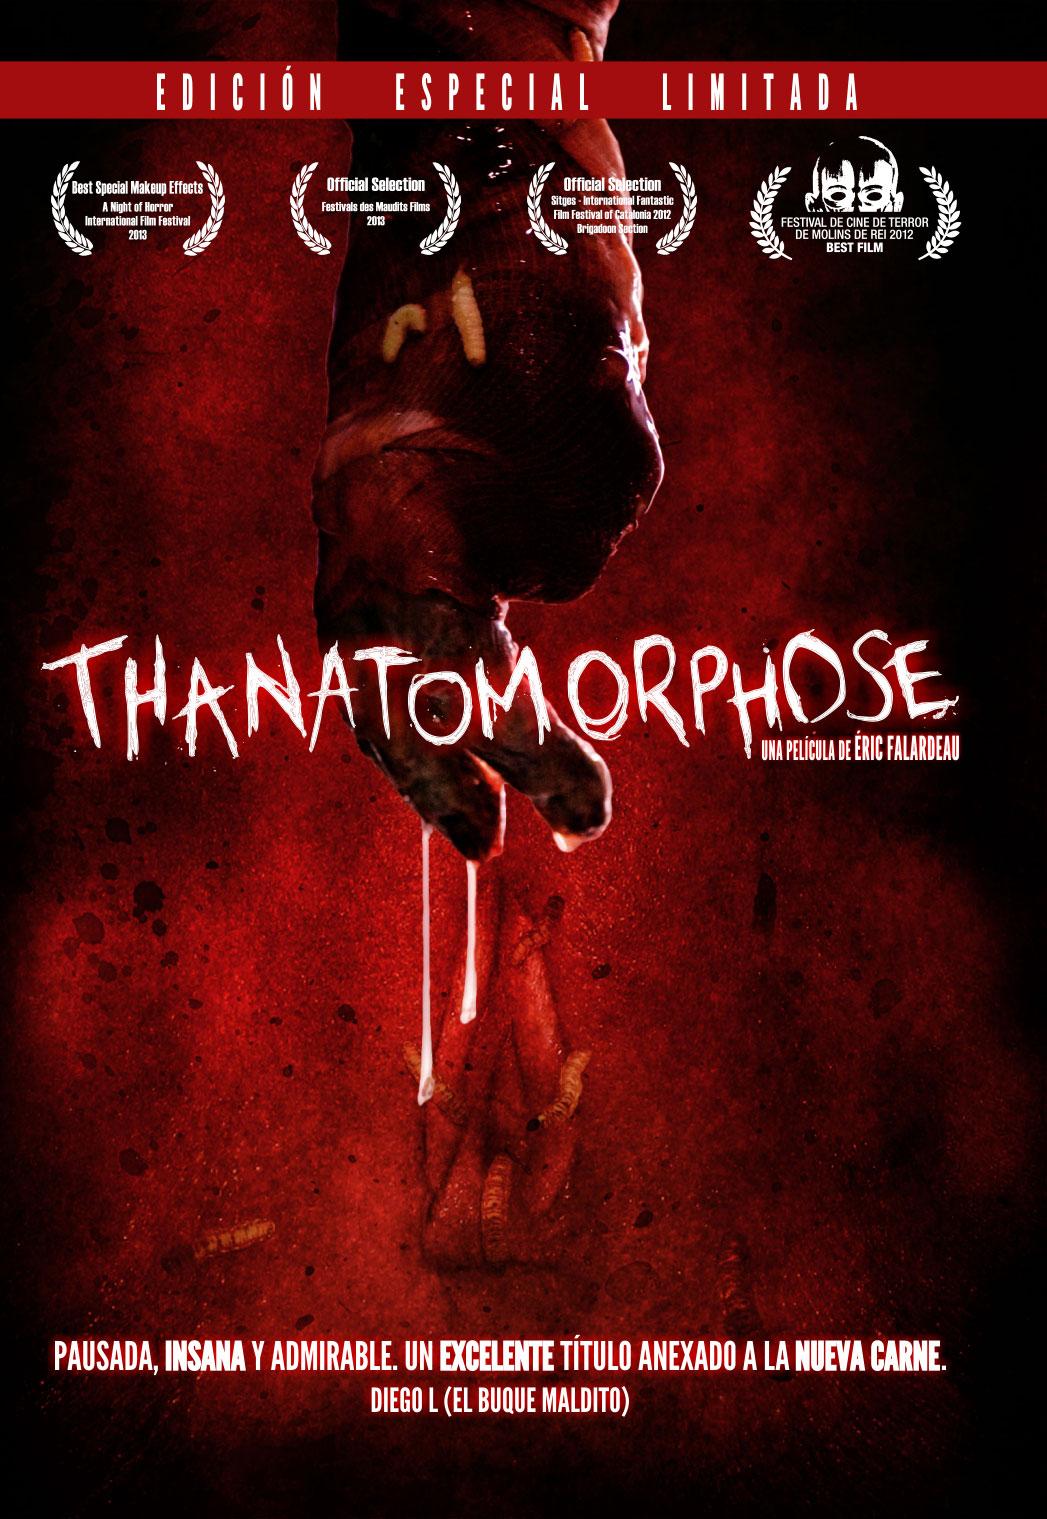 thanatomorphose-poster-dvd.jpg